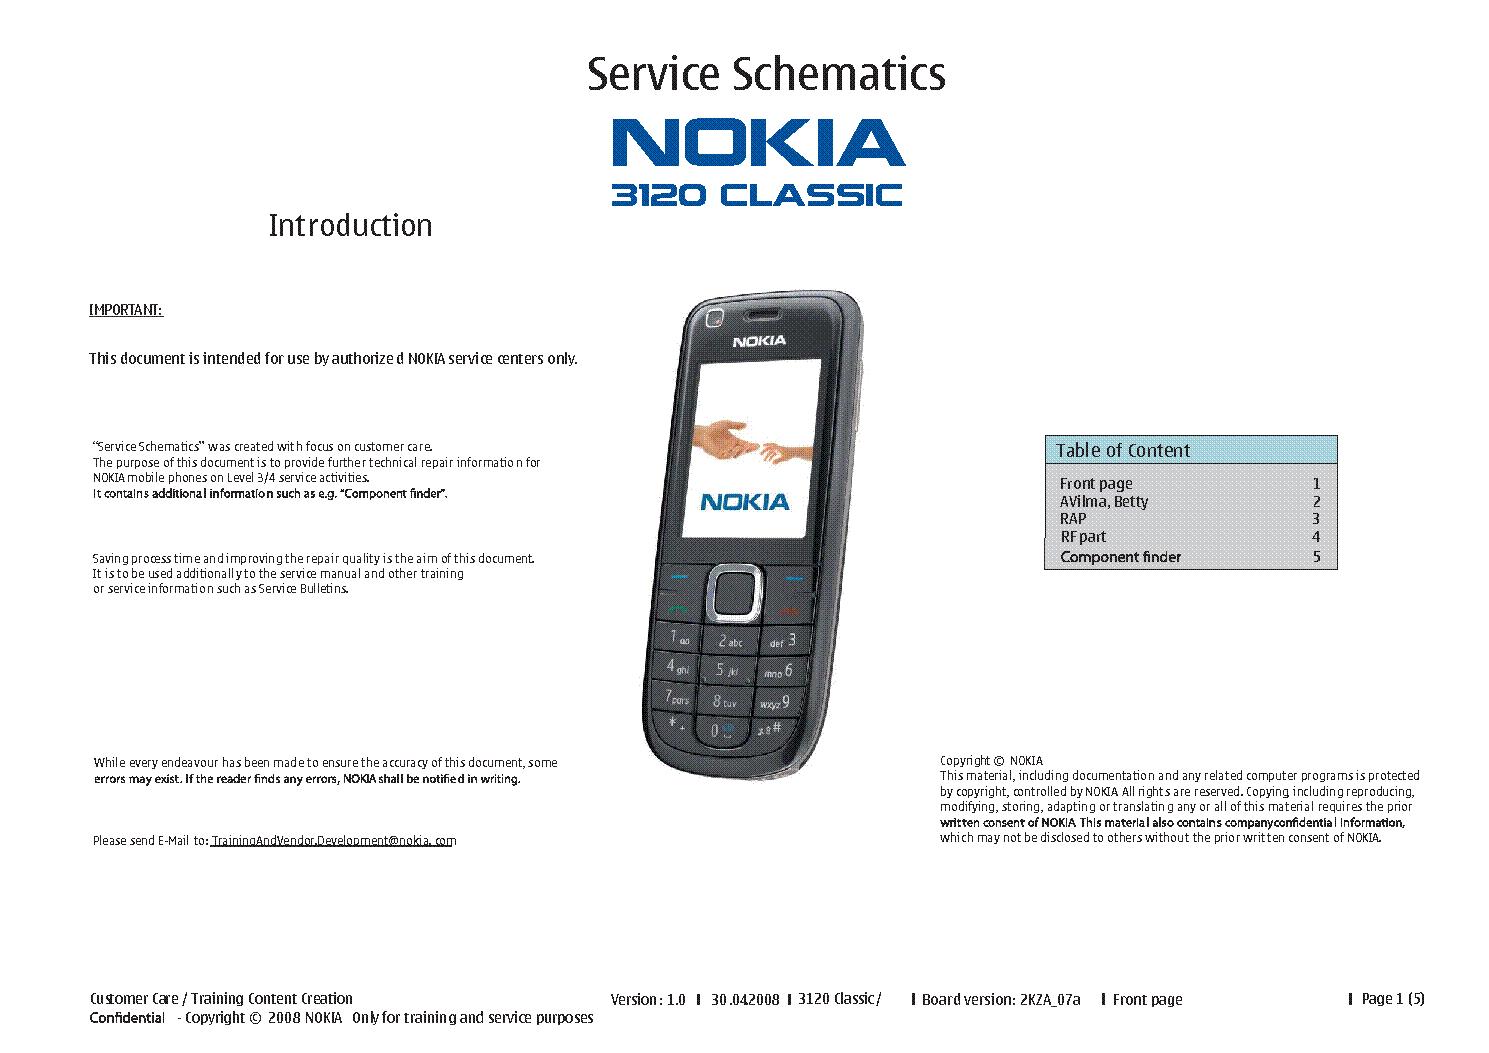 nokia 3120 classic rm 364 v2 0 service manual download schematics rh elektrotanya com Nokia Lumia 520 Manual Nokia Lumia 521 Manual